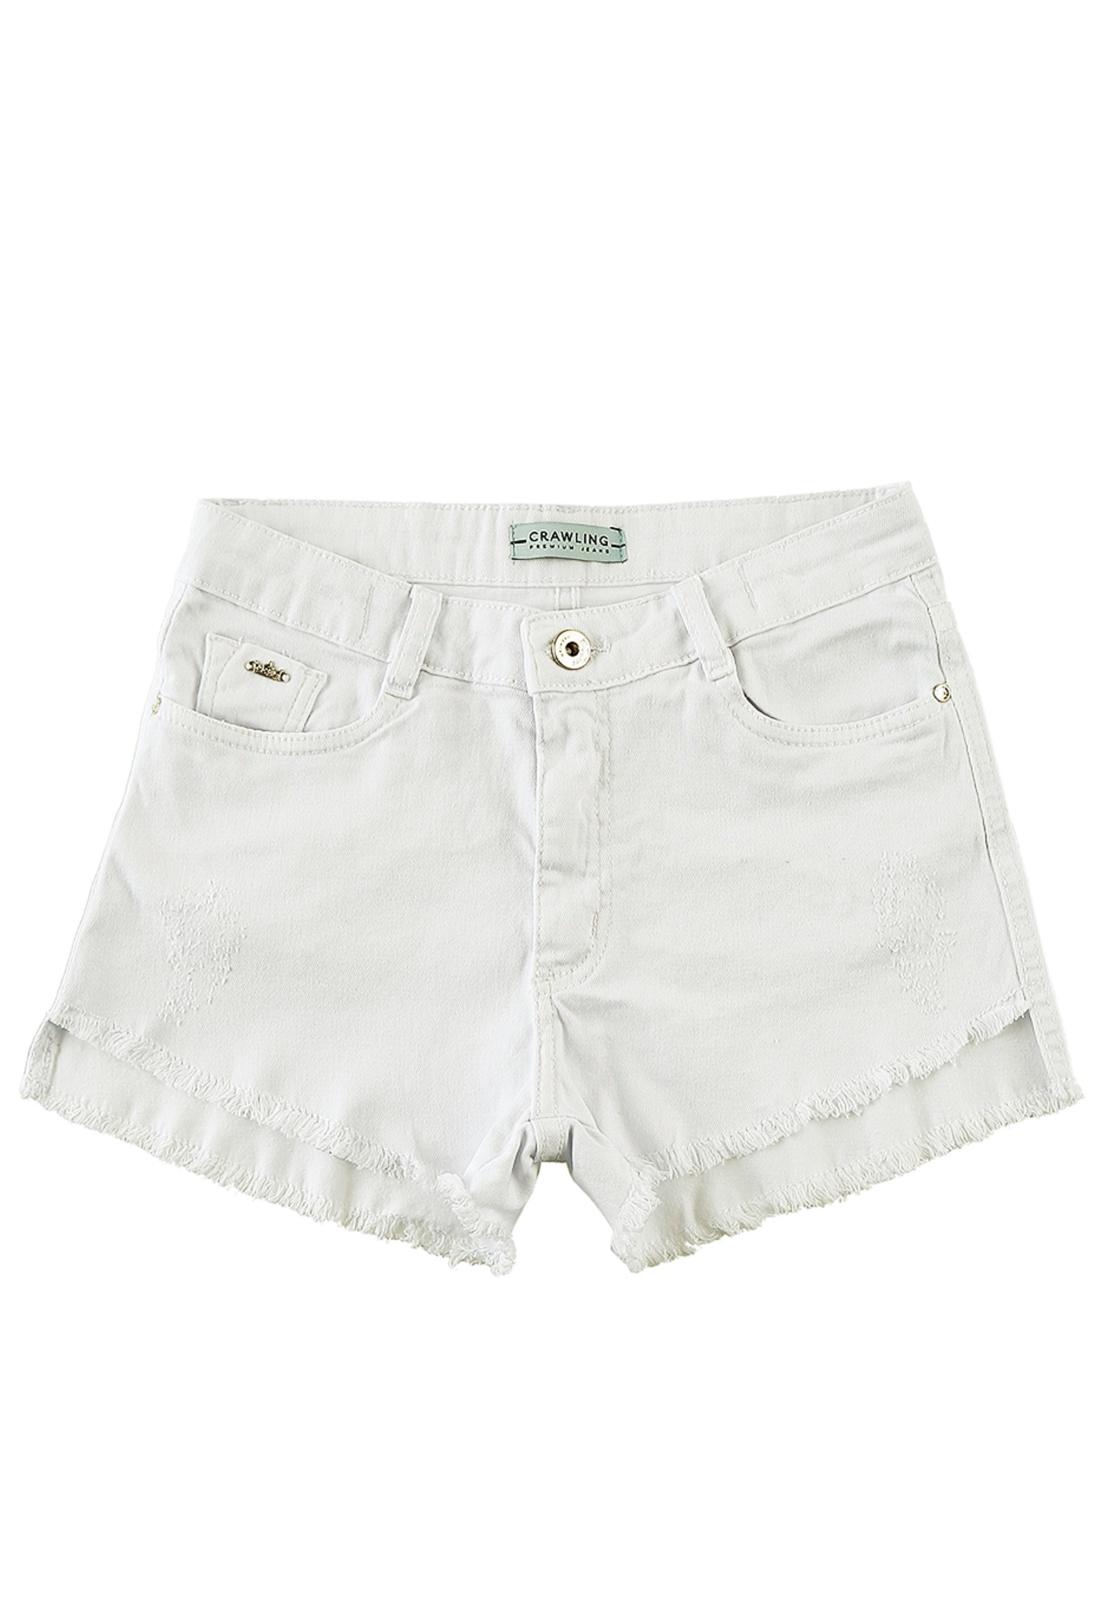 Short Feminino Comfort Crawling Jeans